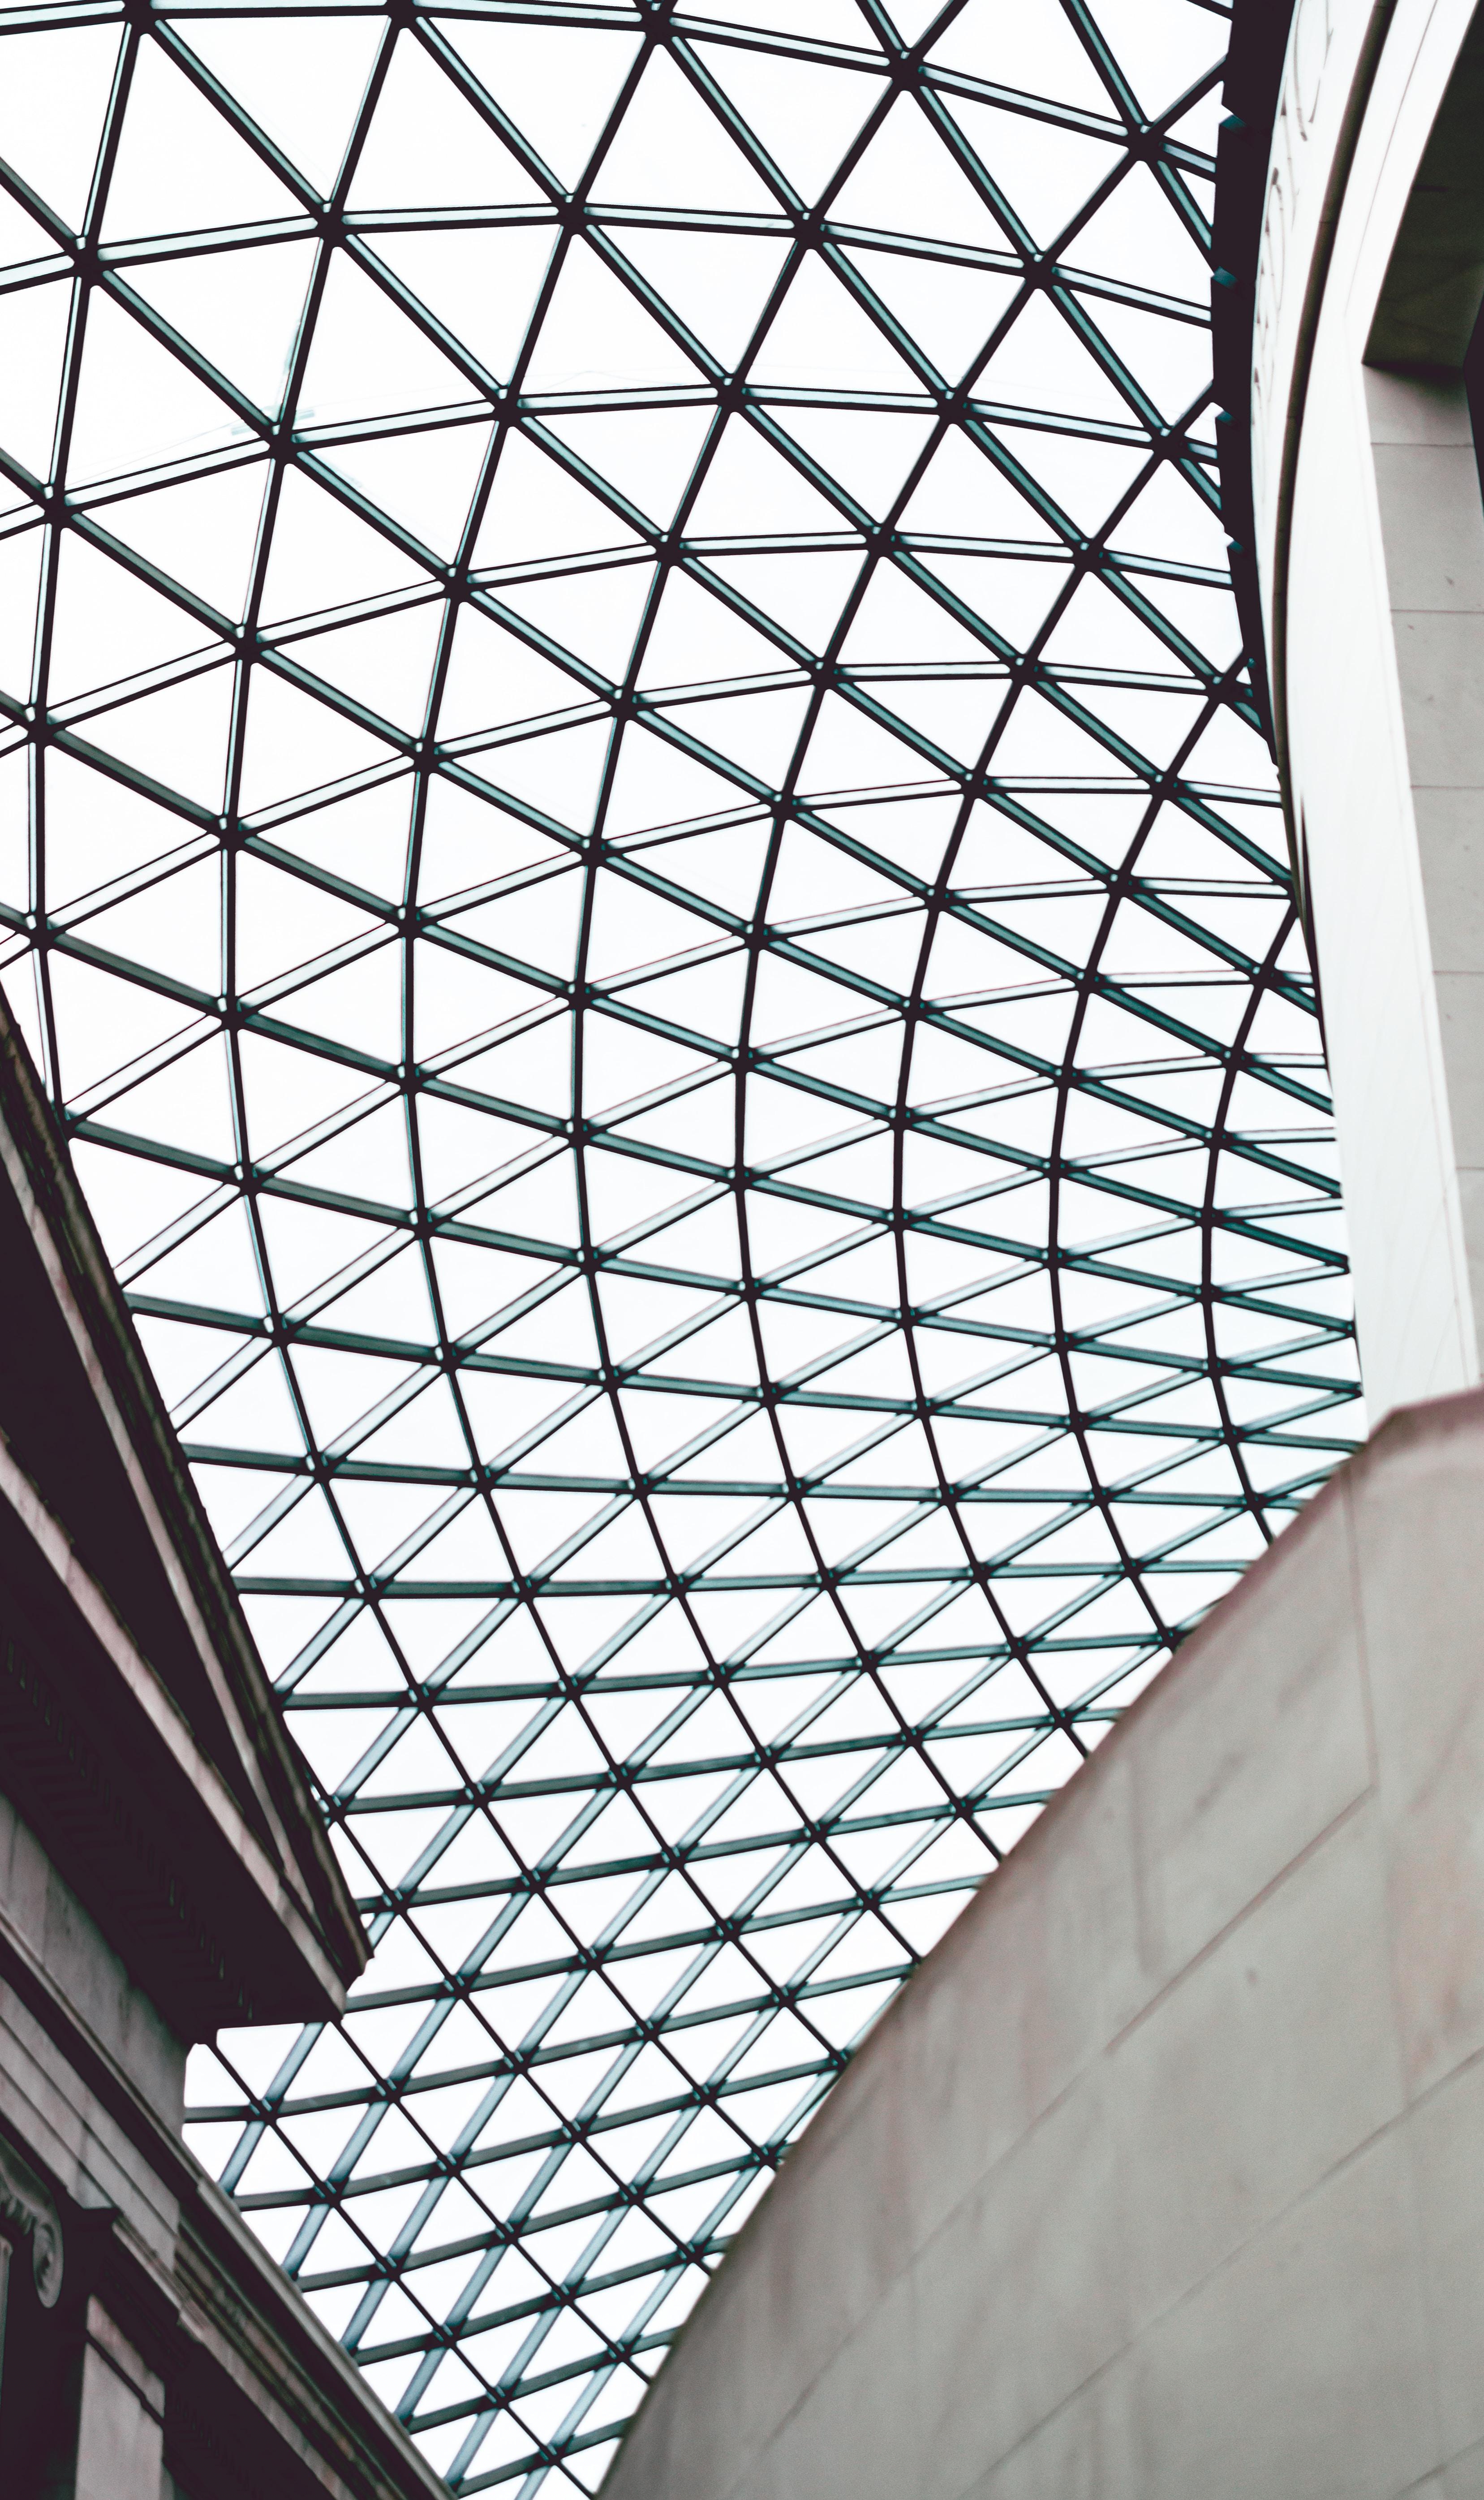 black metal framed glass dome ceiling